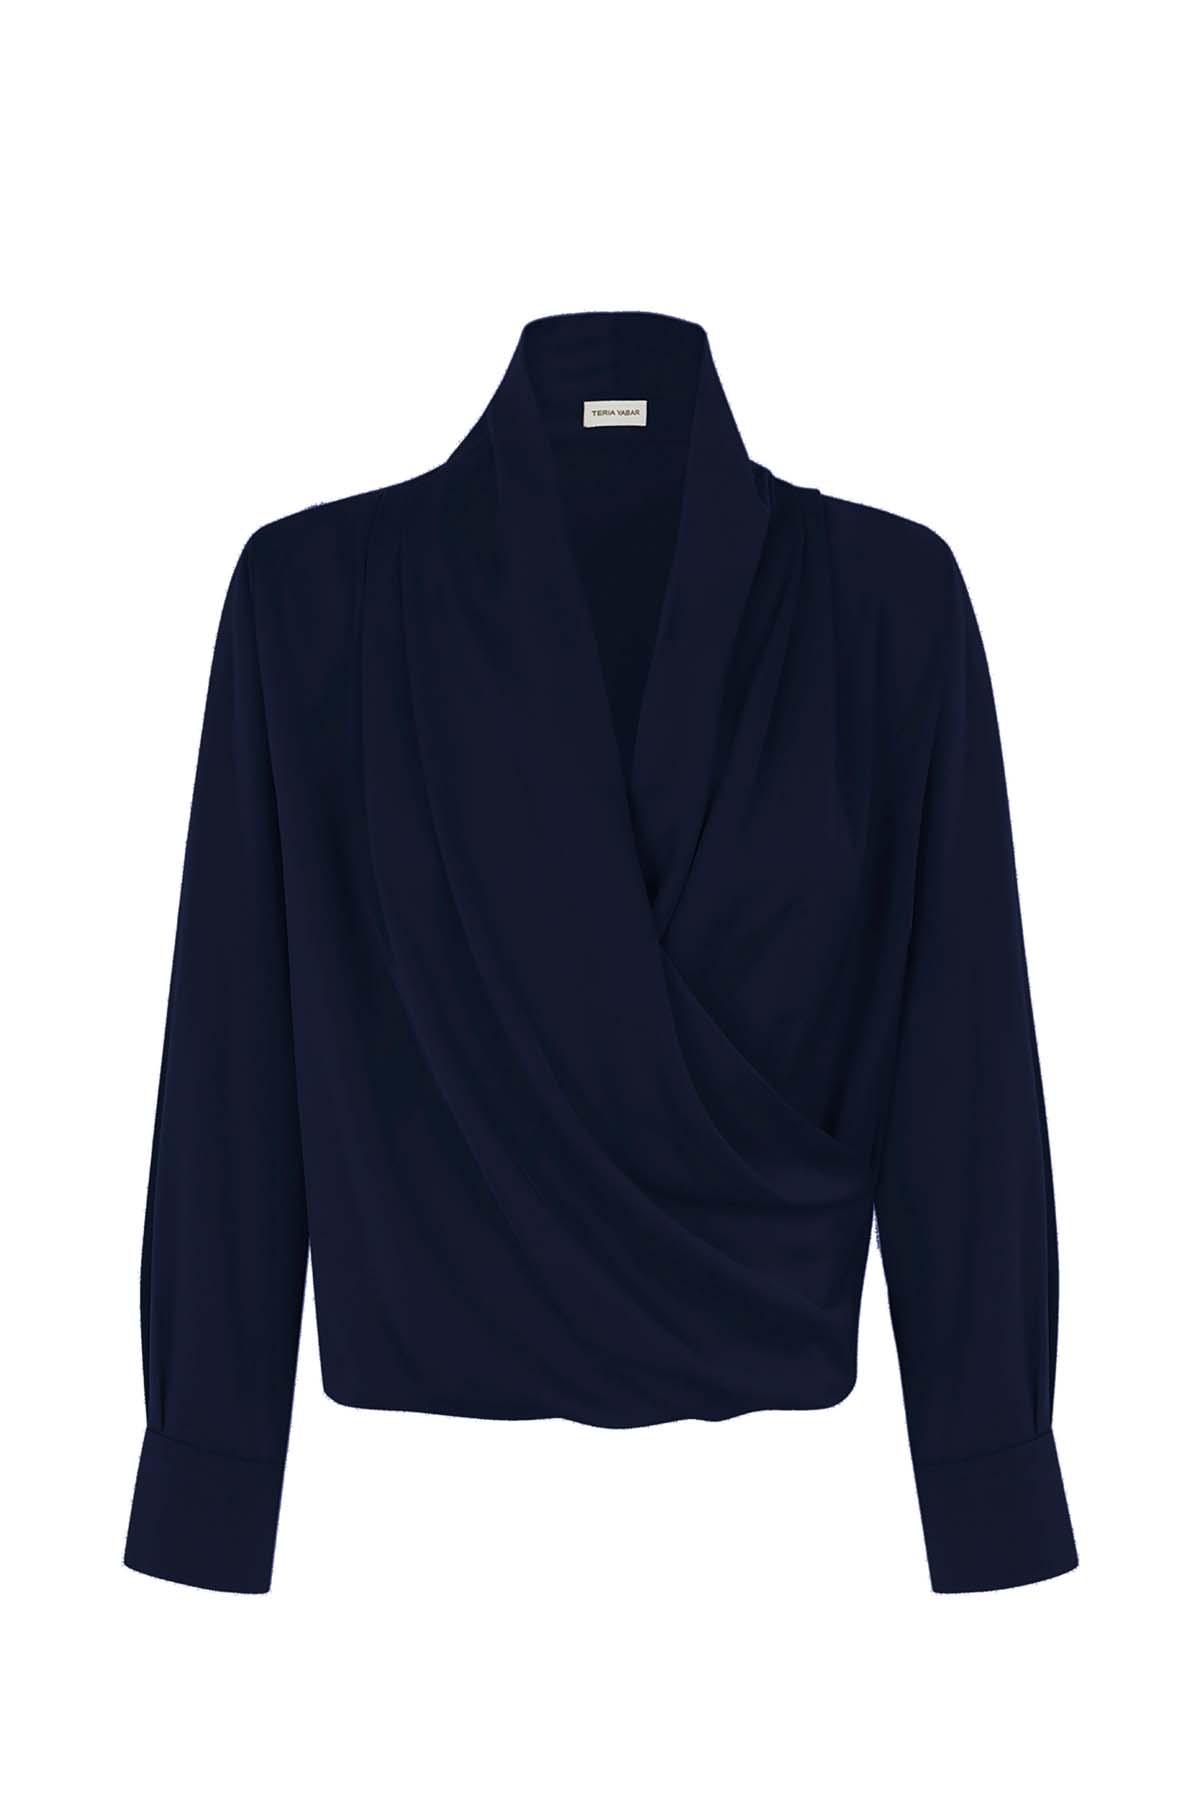 Teria Yabar - Camisa Passy bleu marine